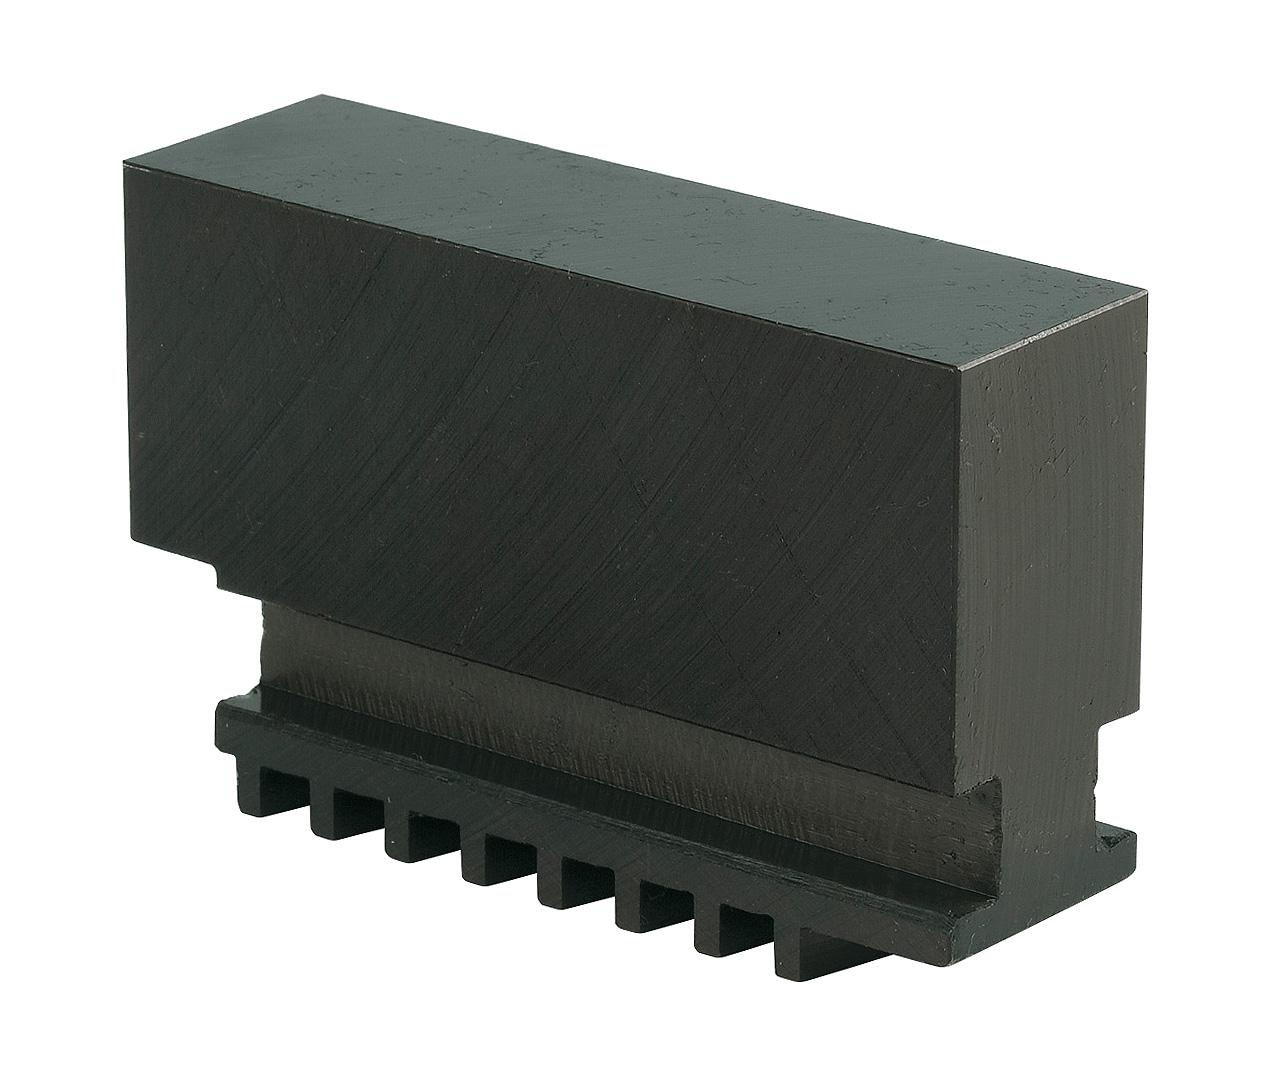 Szczęki jednolite miękkie - komplet SJ-PS3-400 BERNARDO